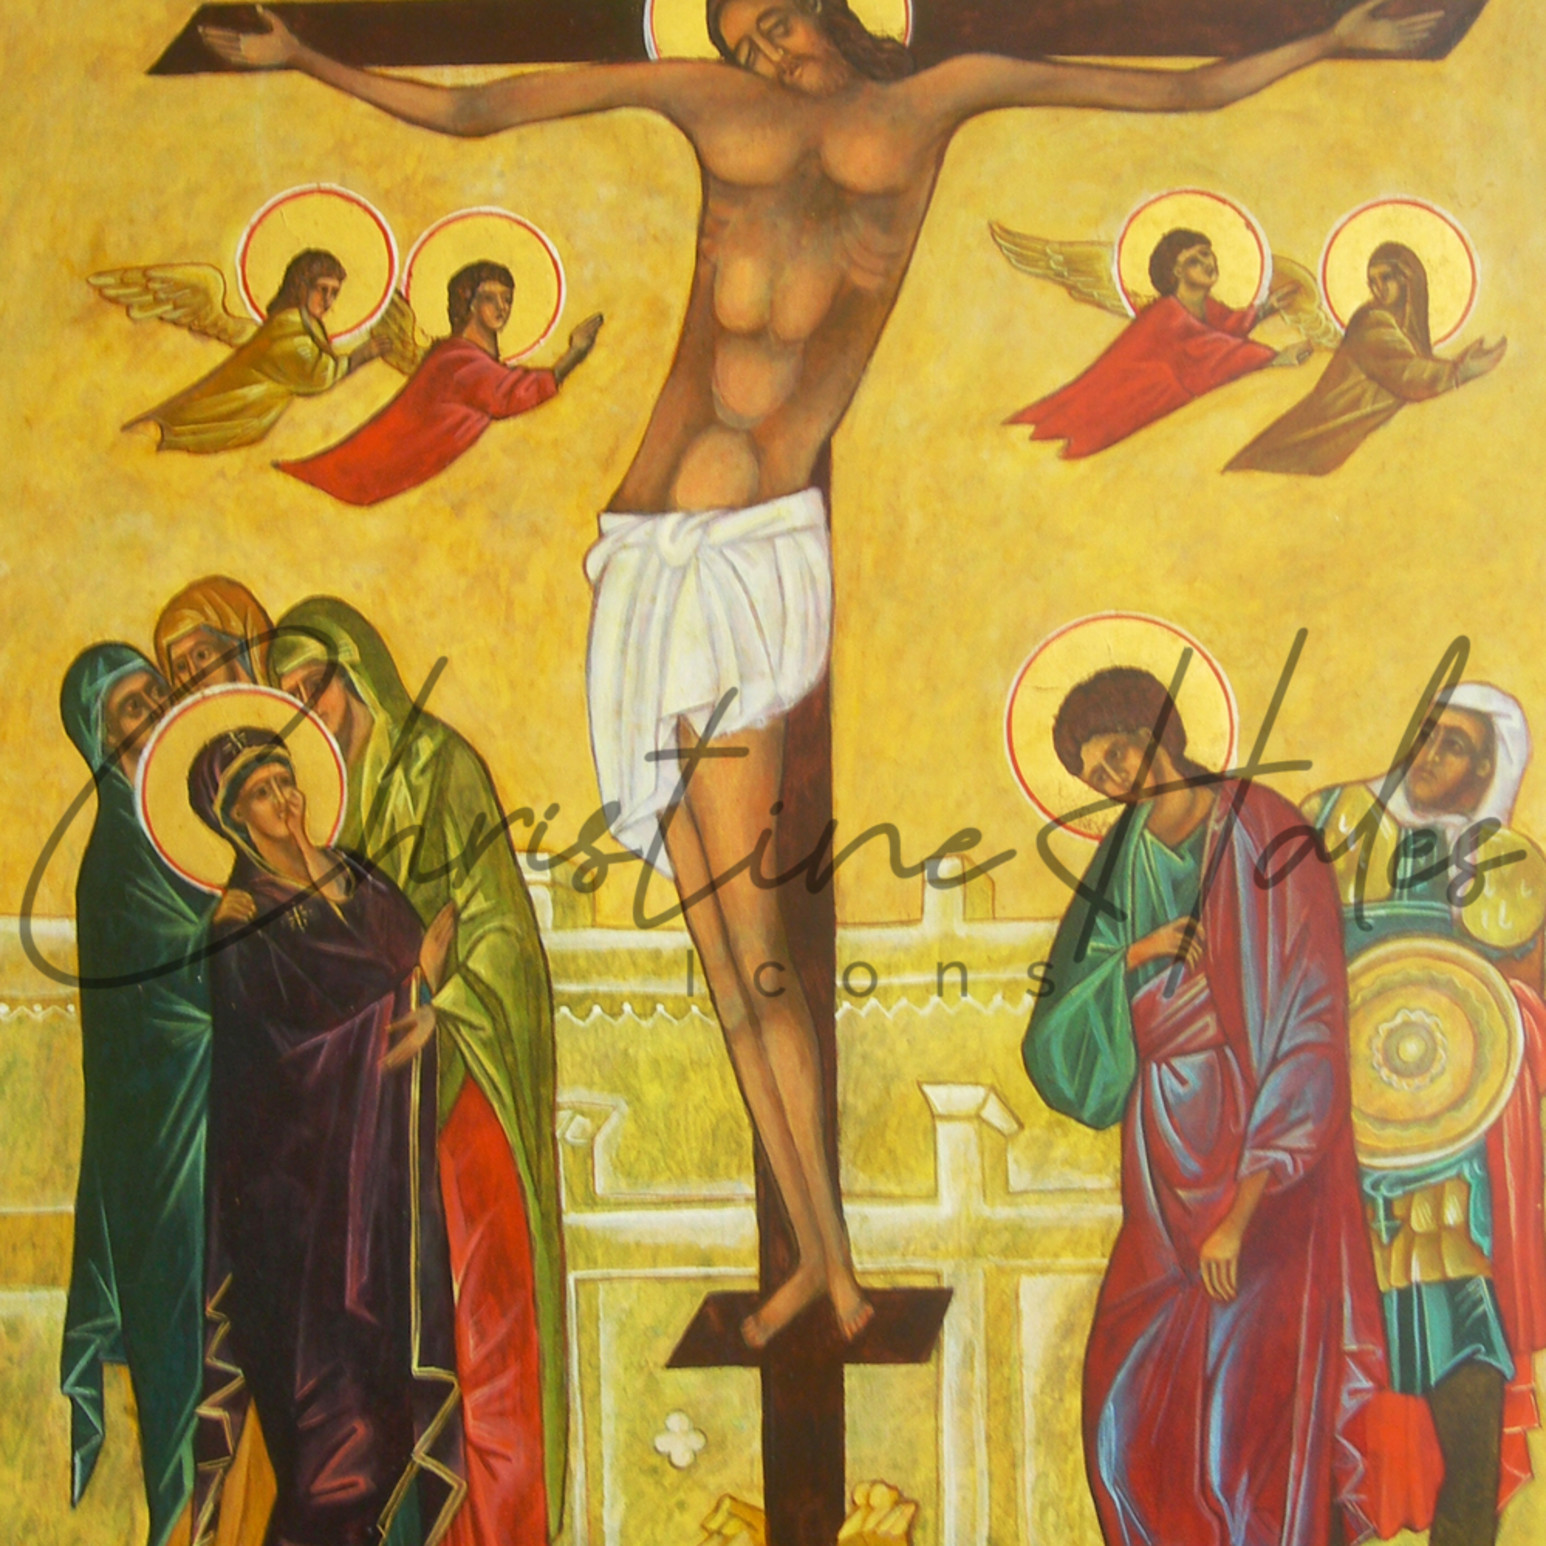 Crucifixion icon c. hales kqmqco